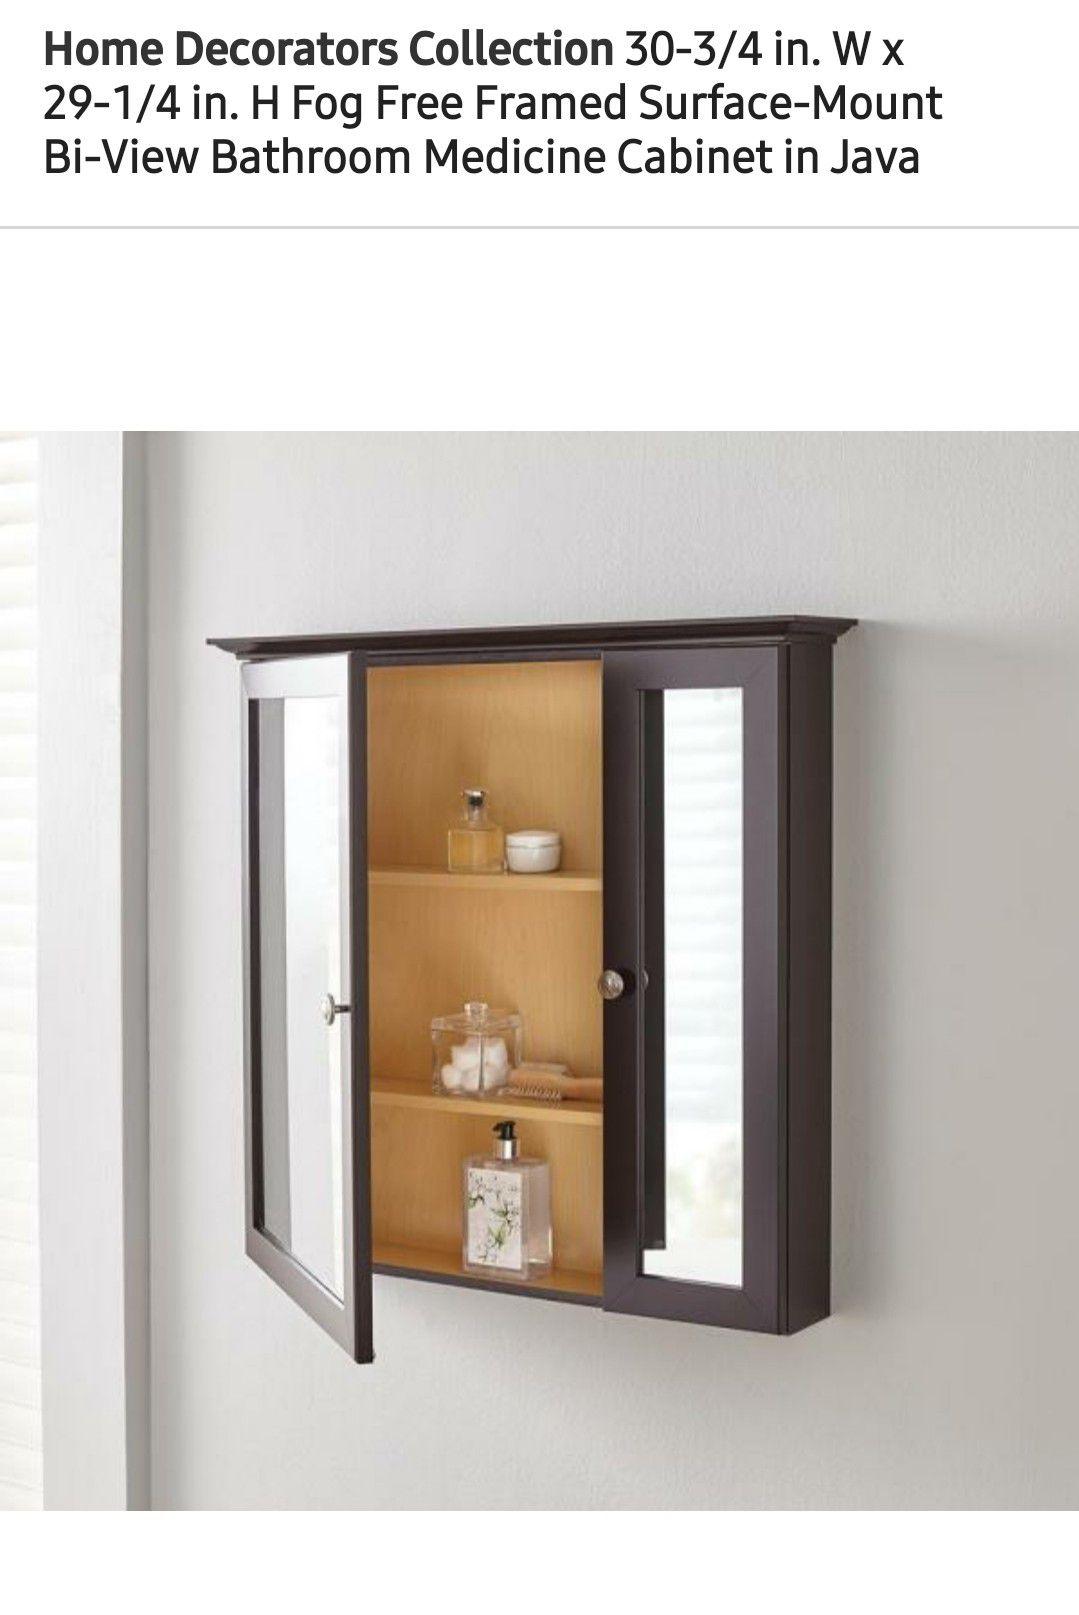 New Home Decorators Fog Free Framed Medician Cabinet, Retail $100!!!-$50(